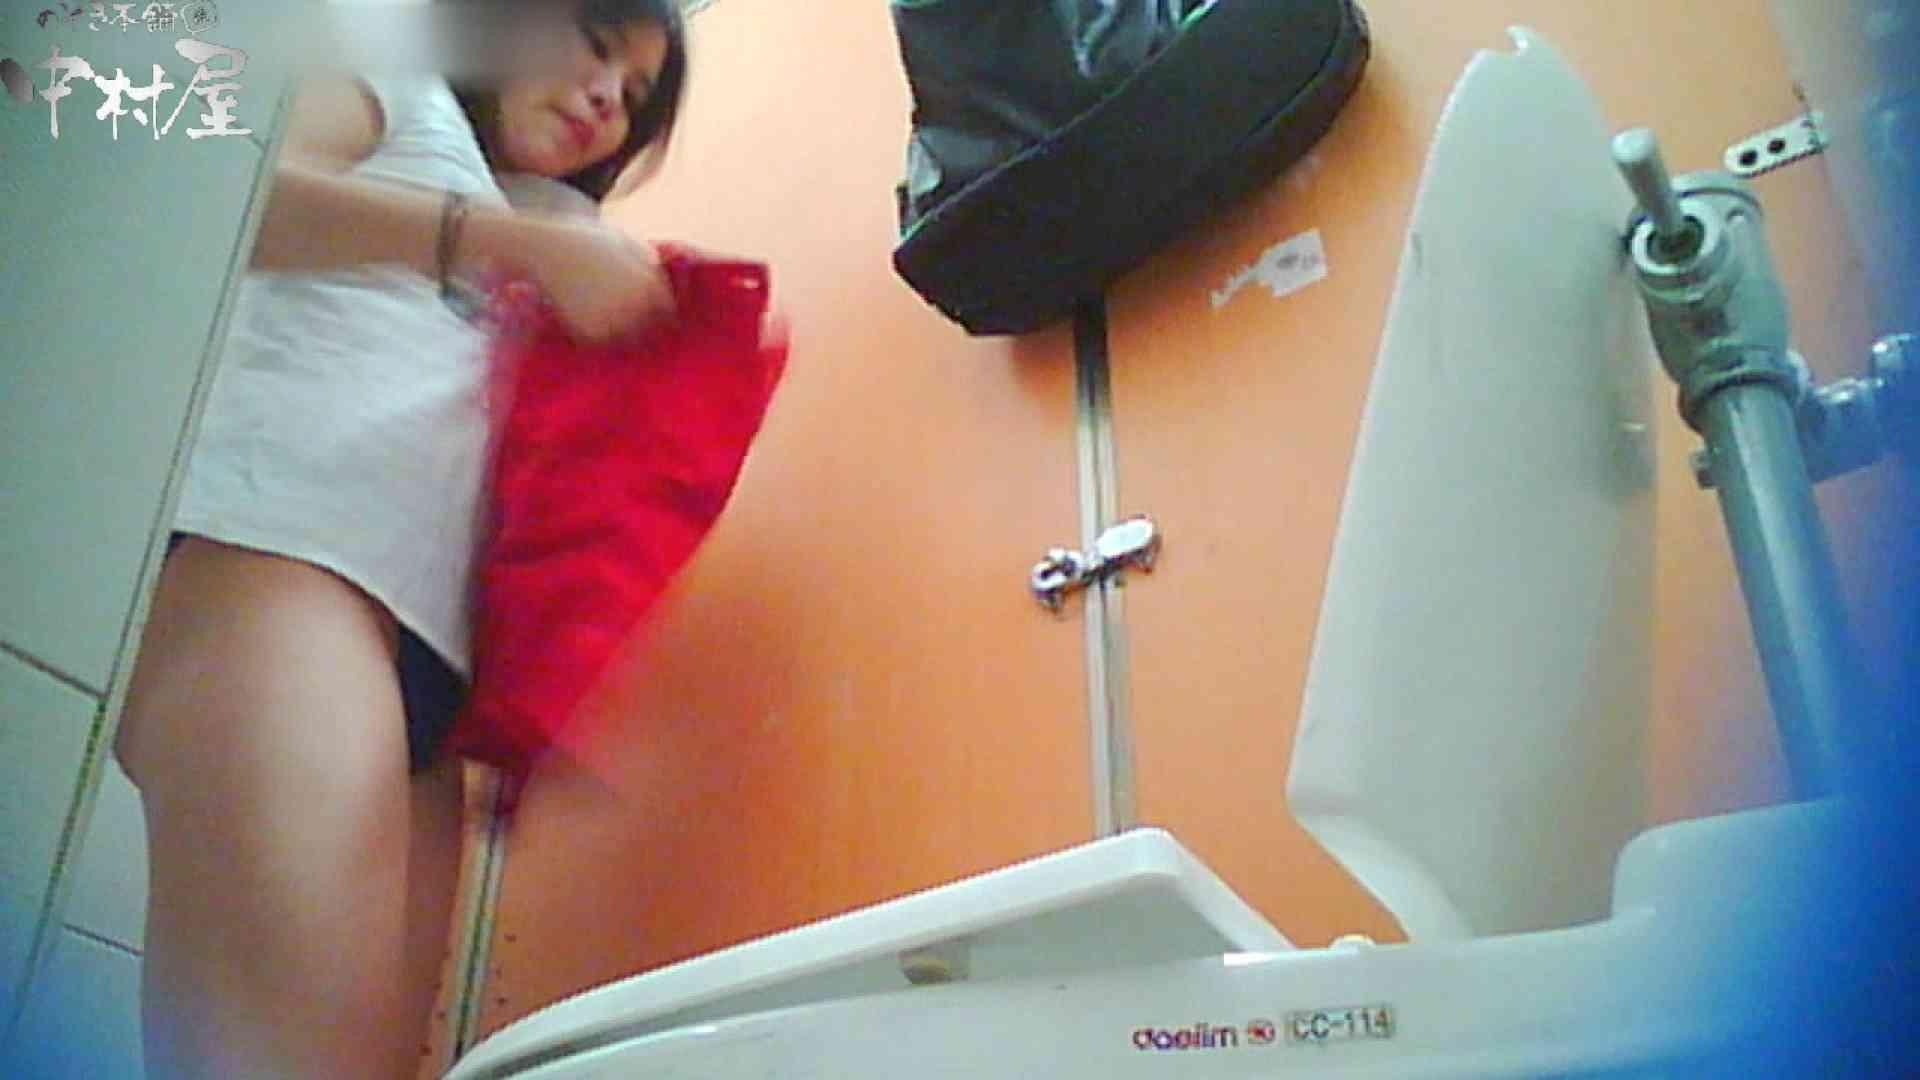 韓流トイレ盗撮vol.14 盗撮シリーズ 盗撮動画紹介 97PIX 77